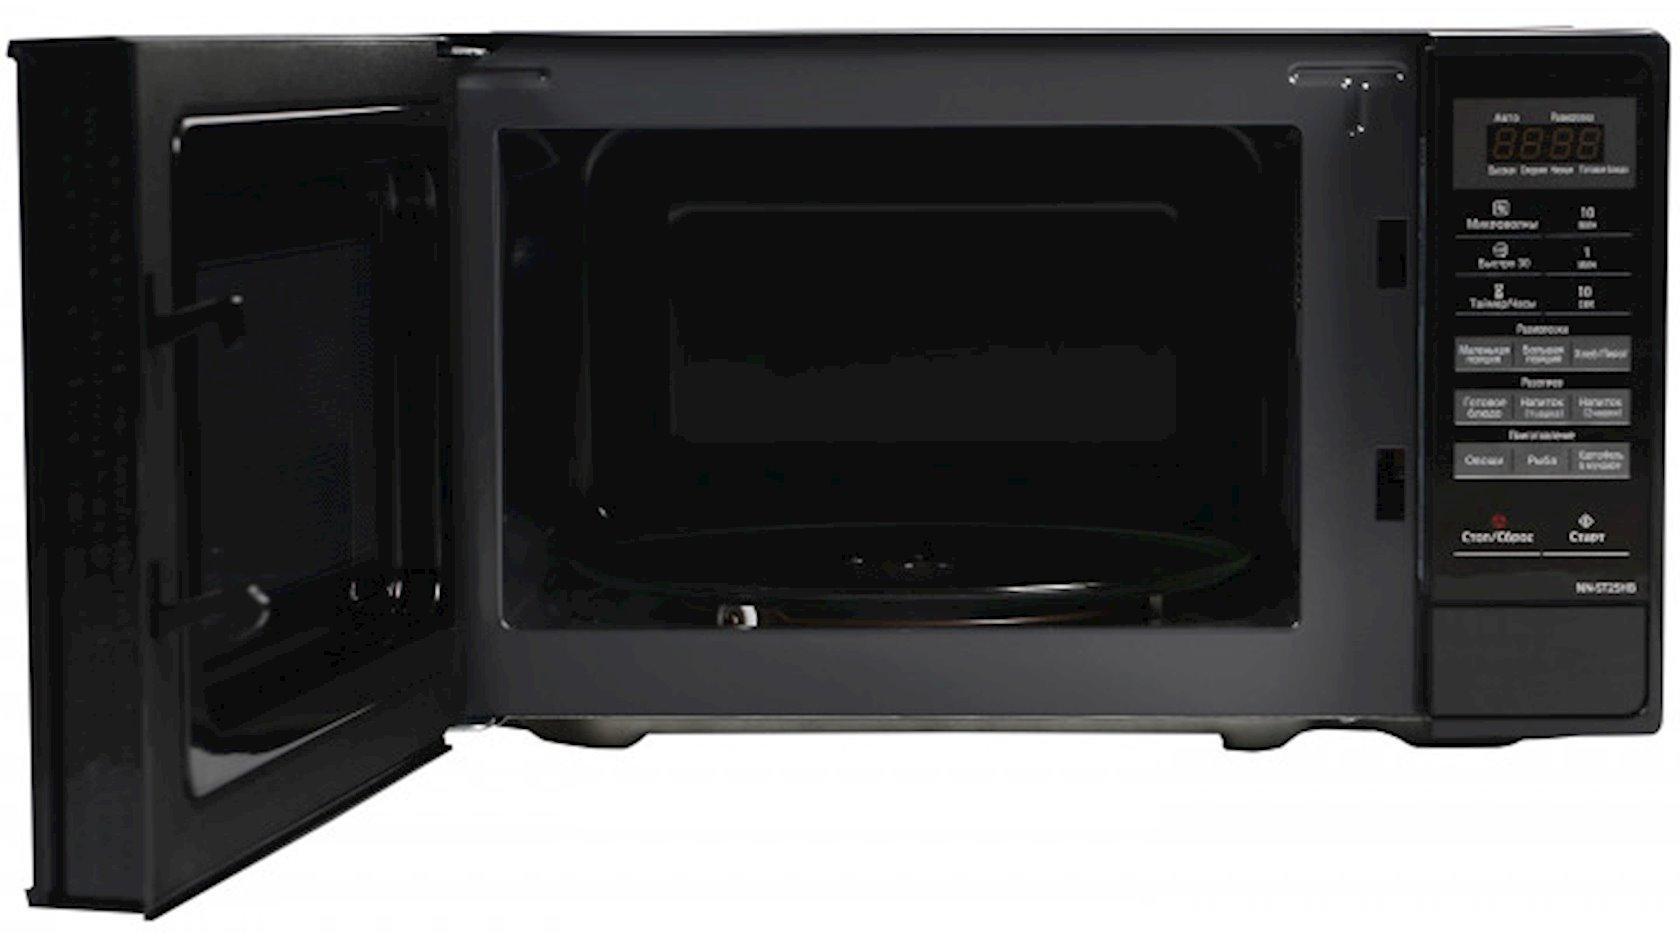 Микроволновая печь Panasonic NN-ST25HBZPE 800W, чёрный